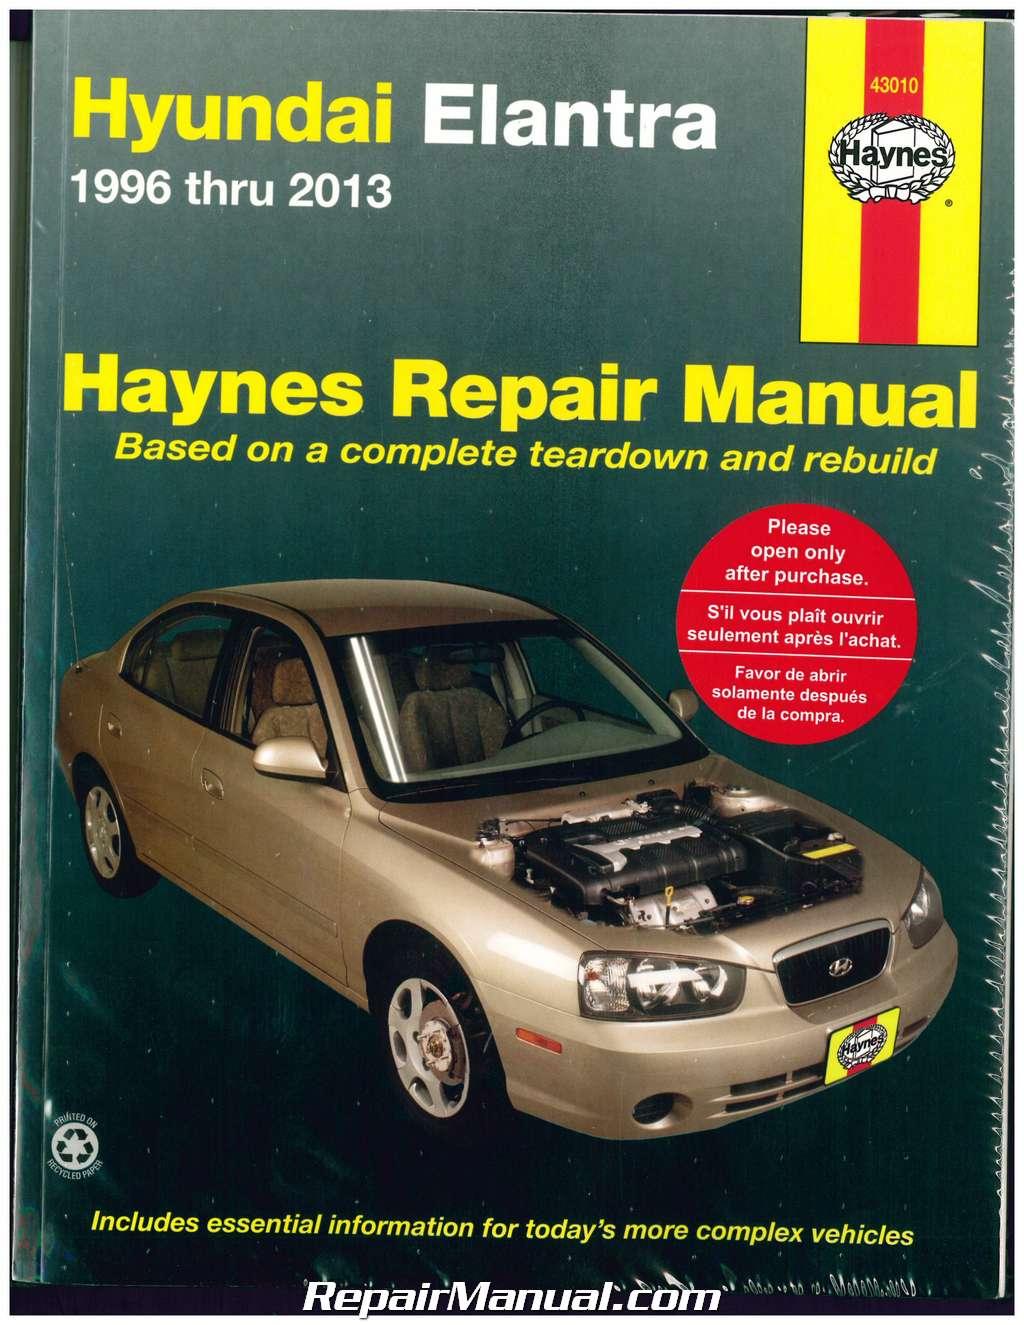 haynes hyundai elantra 1996 2013 auto repair manual rh repairmanual com Hyundai Repair Manual PDF Hyundai Sonata Repair Manual